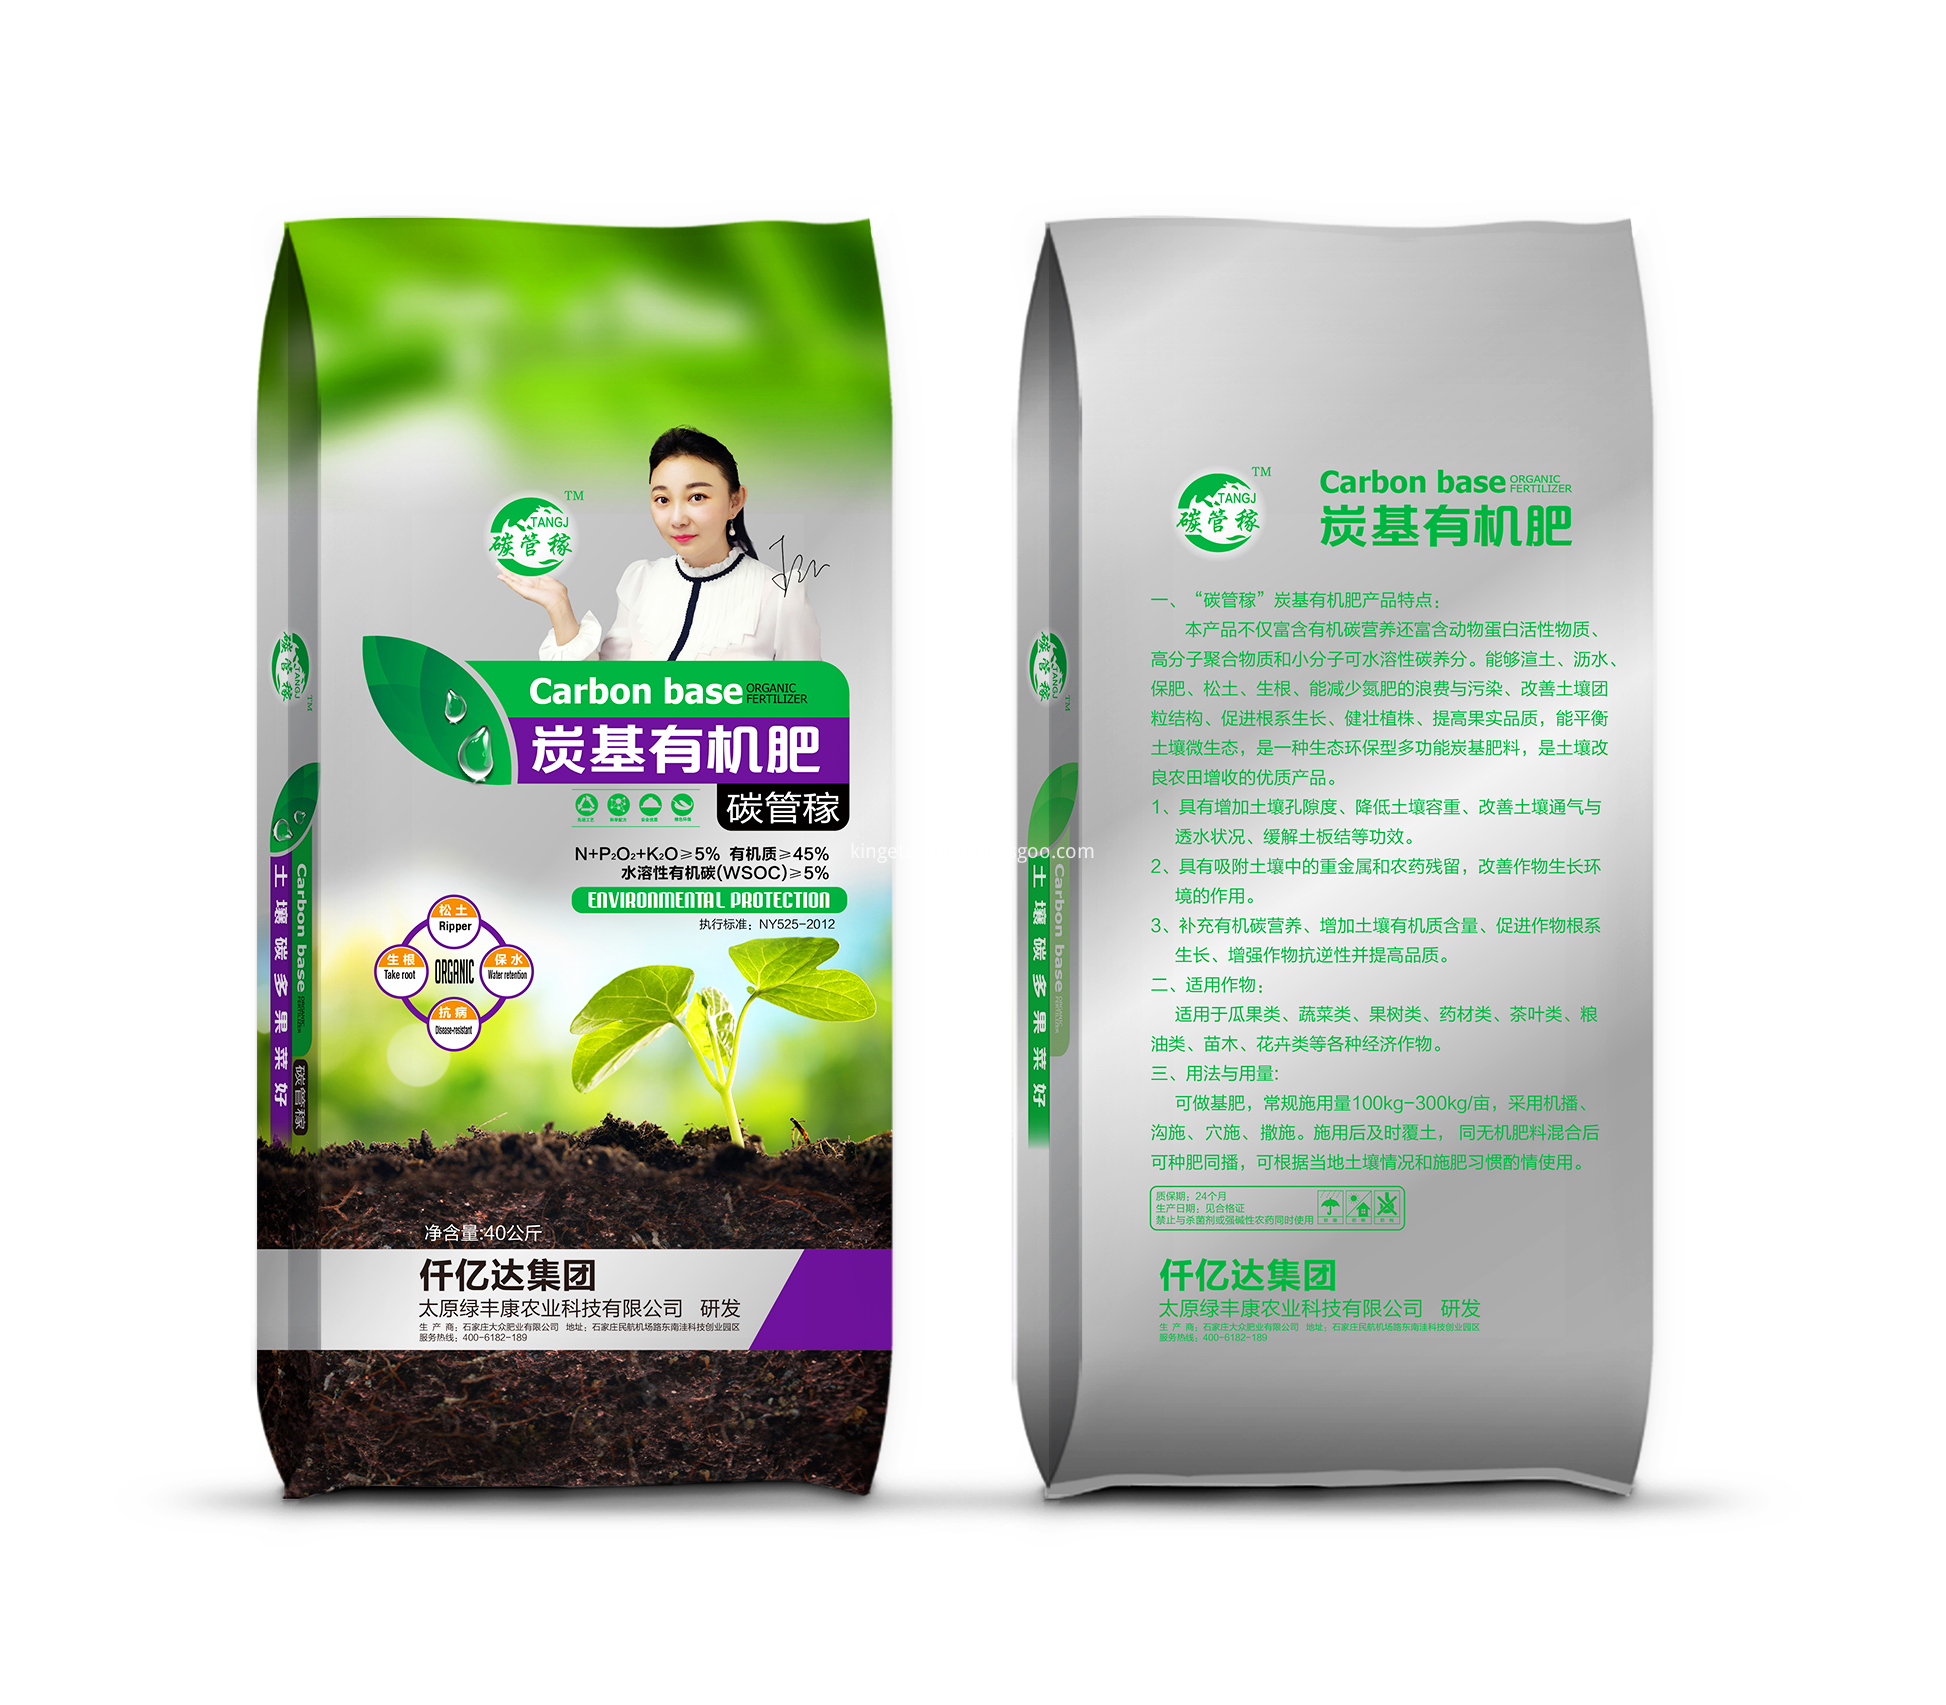 Carbon based organic fertilizer